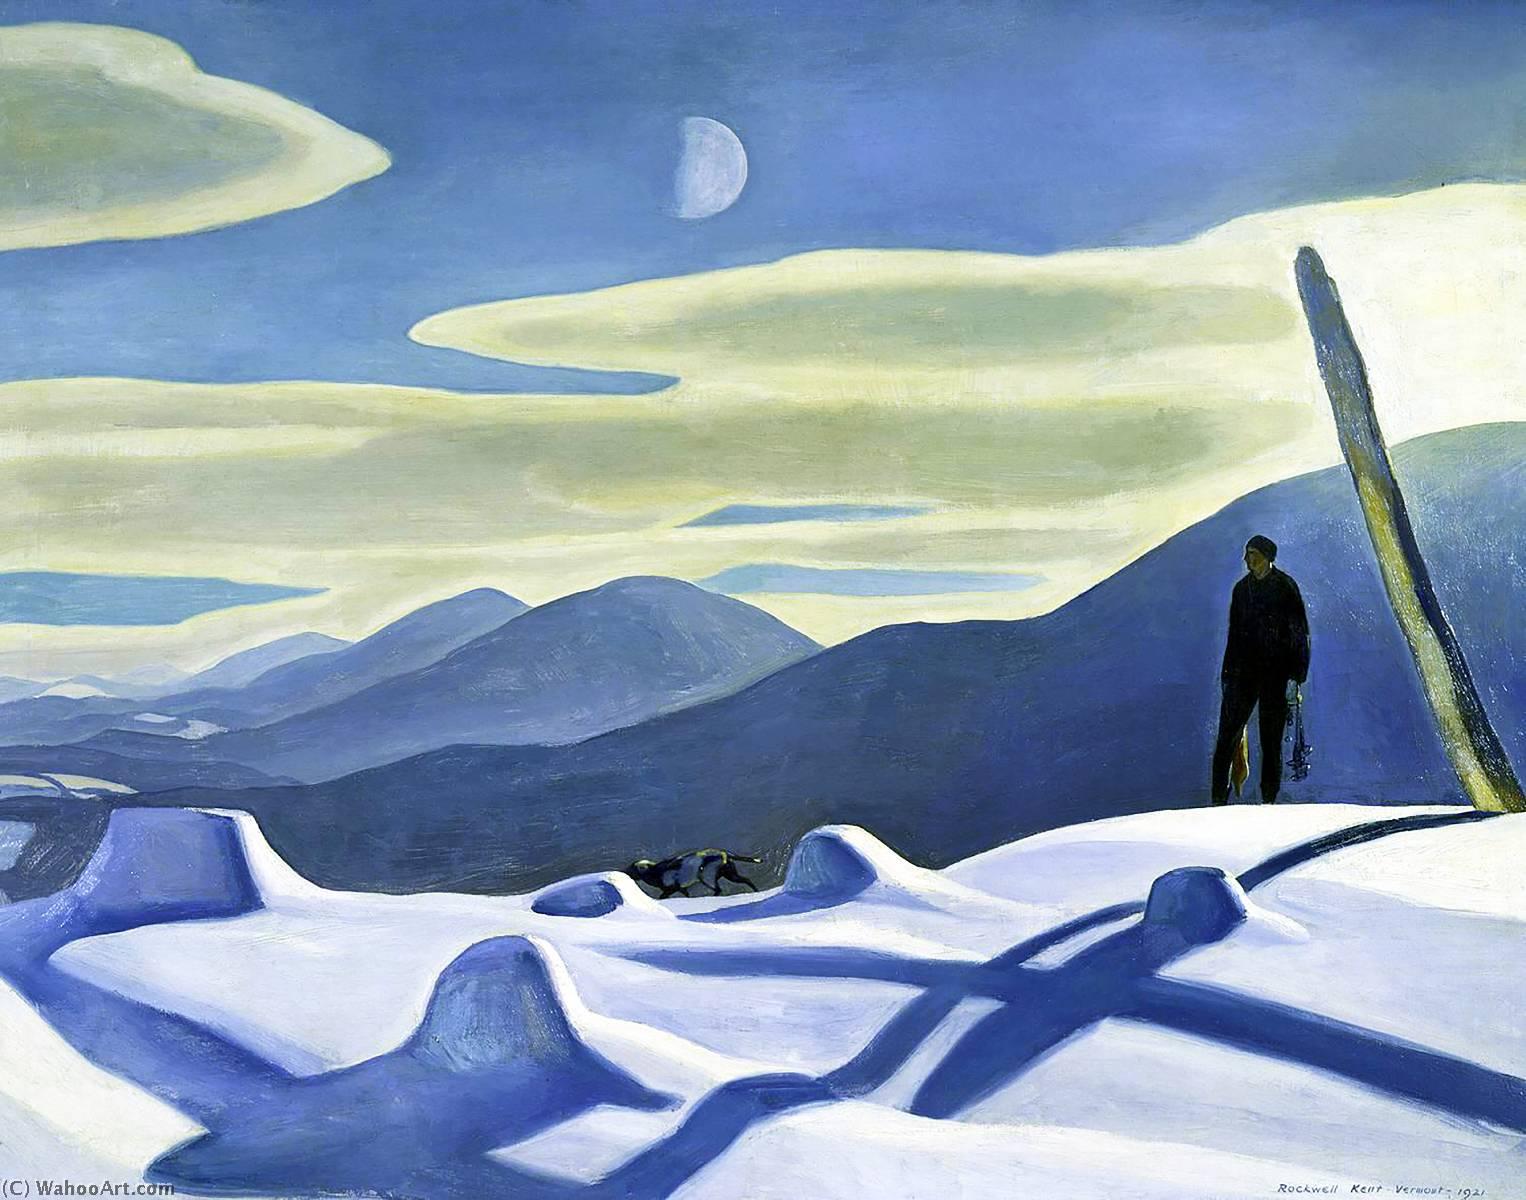 Ross-on-Wye, BR (WR), c.1951 Art Print | Art.com